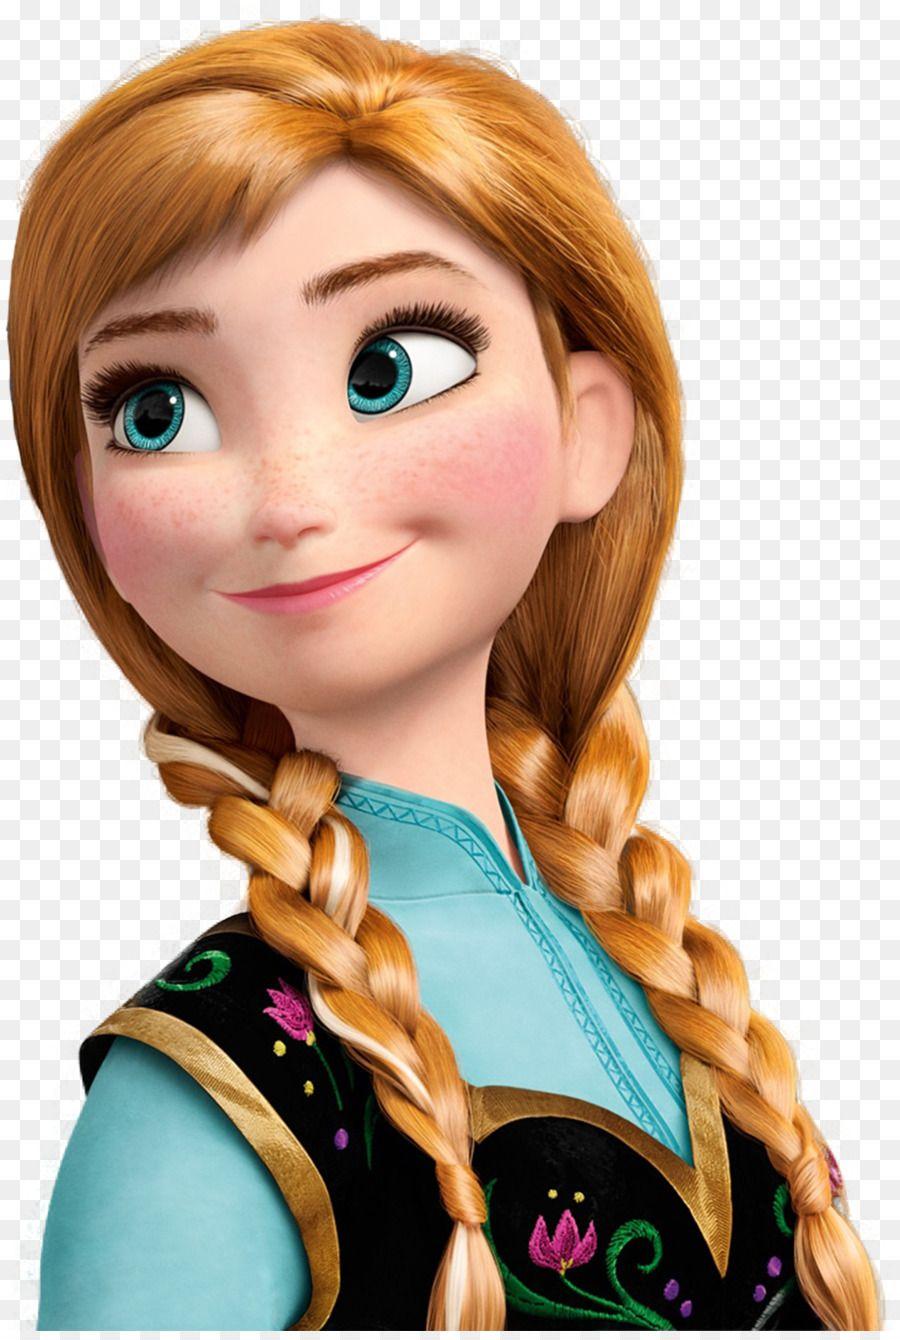 Elsa Anna Frozen Kristoff Anna Png Picture Anna Disney Elsa De Frozen Imagens De Princesa Disney